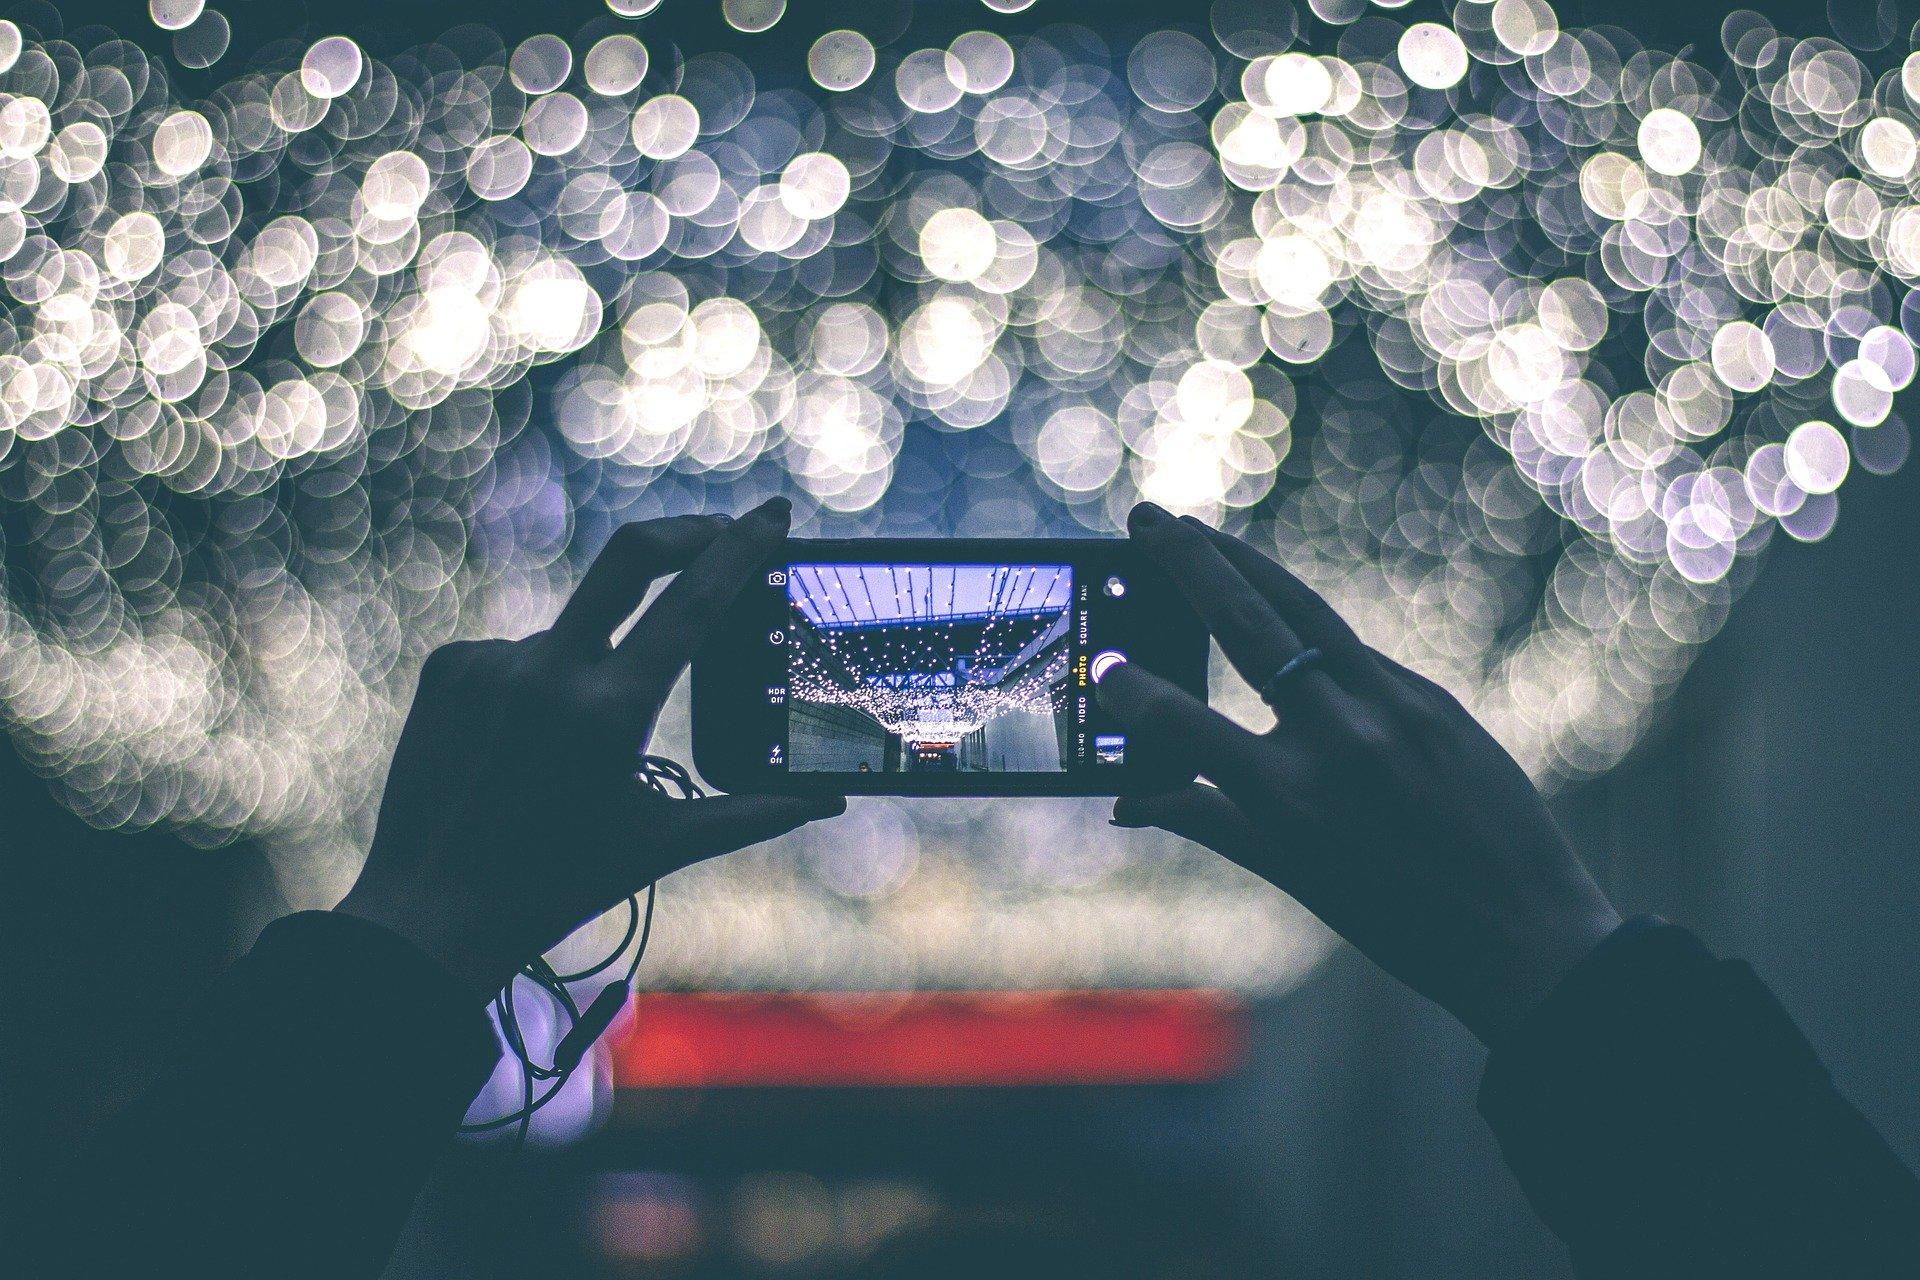 LGの2画面スマホのカメラ